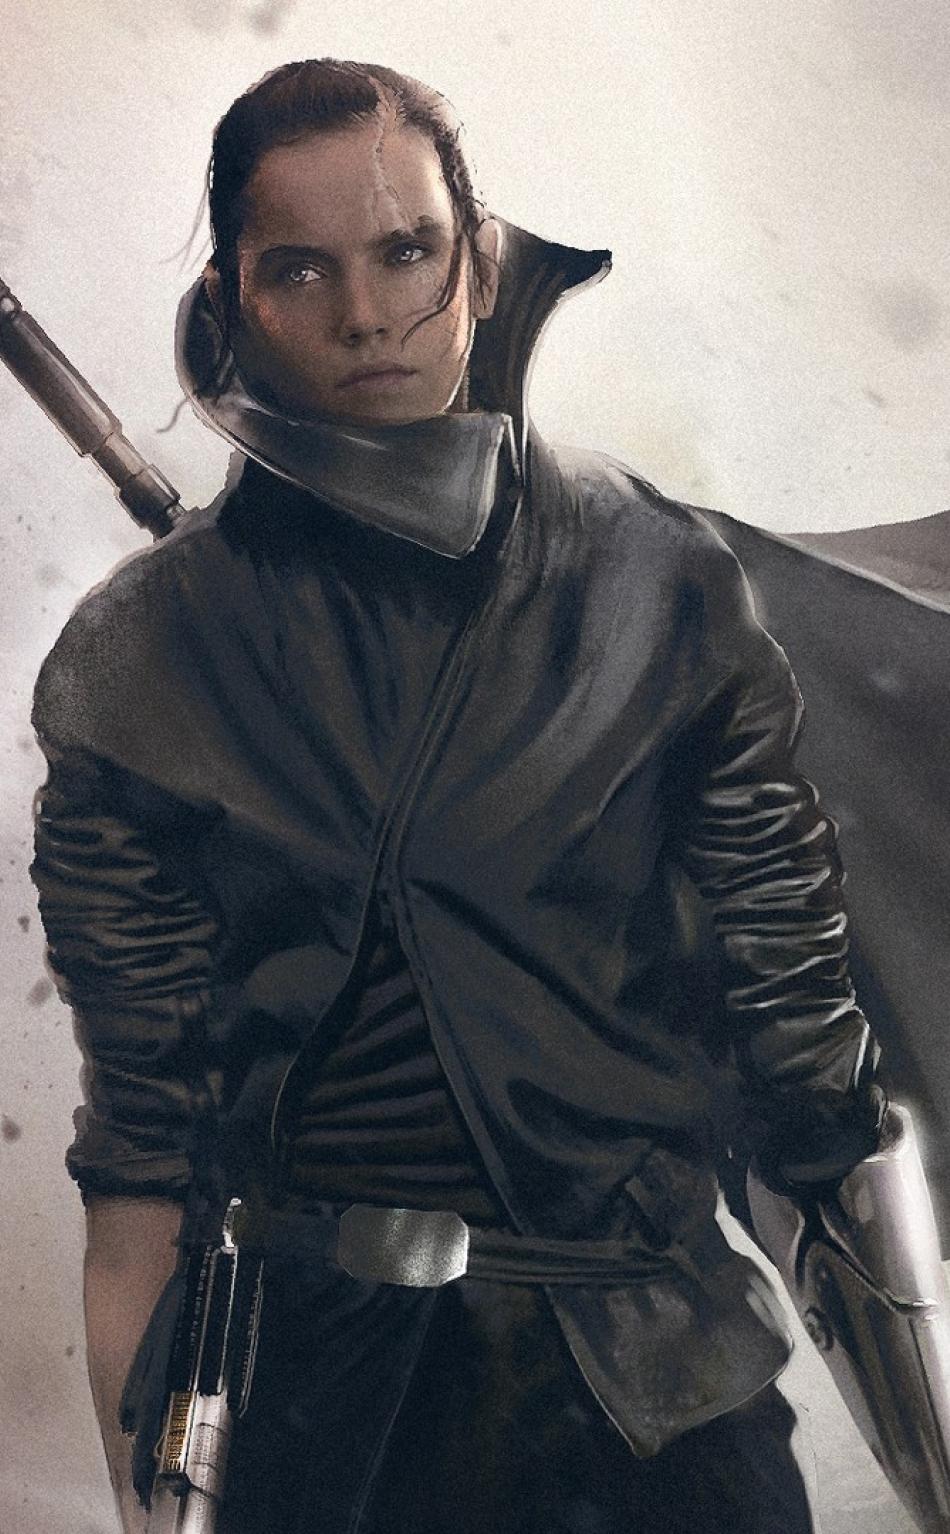 Daisy Ridley As Rey In Star Wars The Last Jedi Full Hd